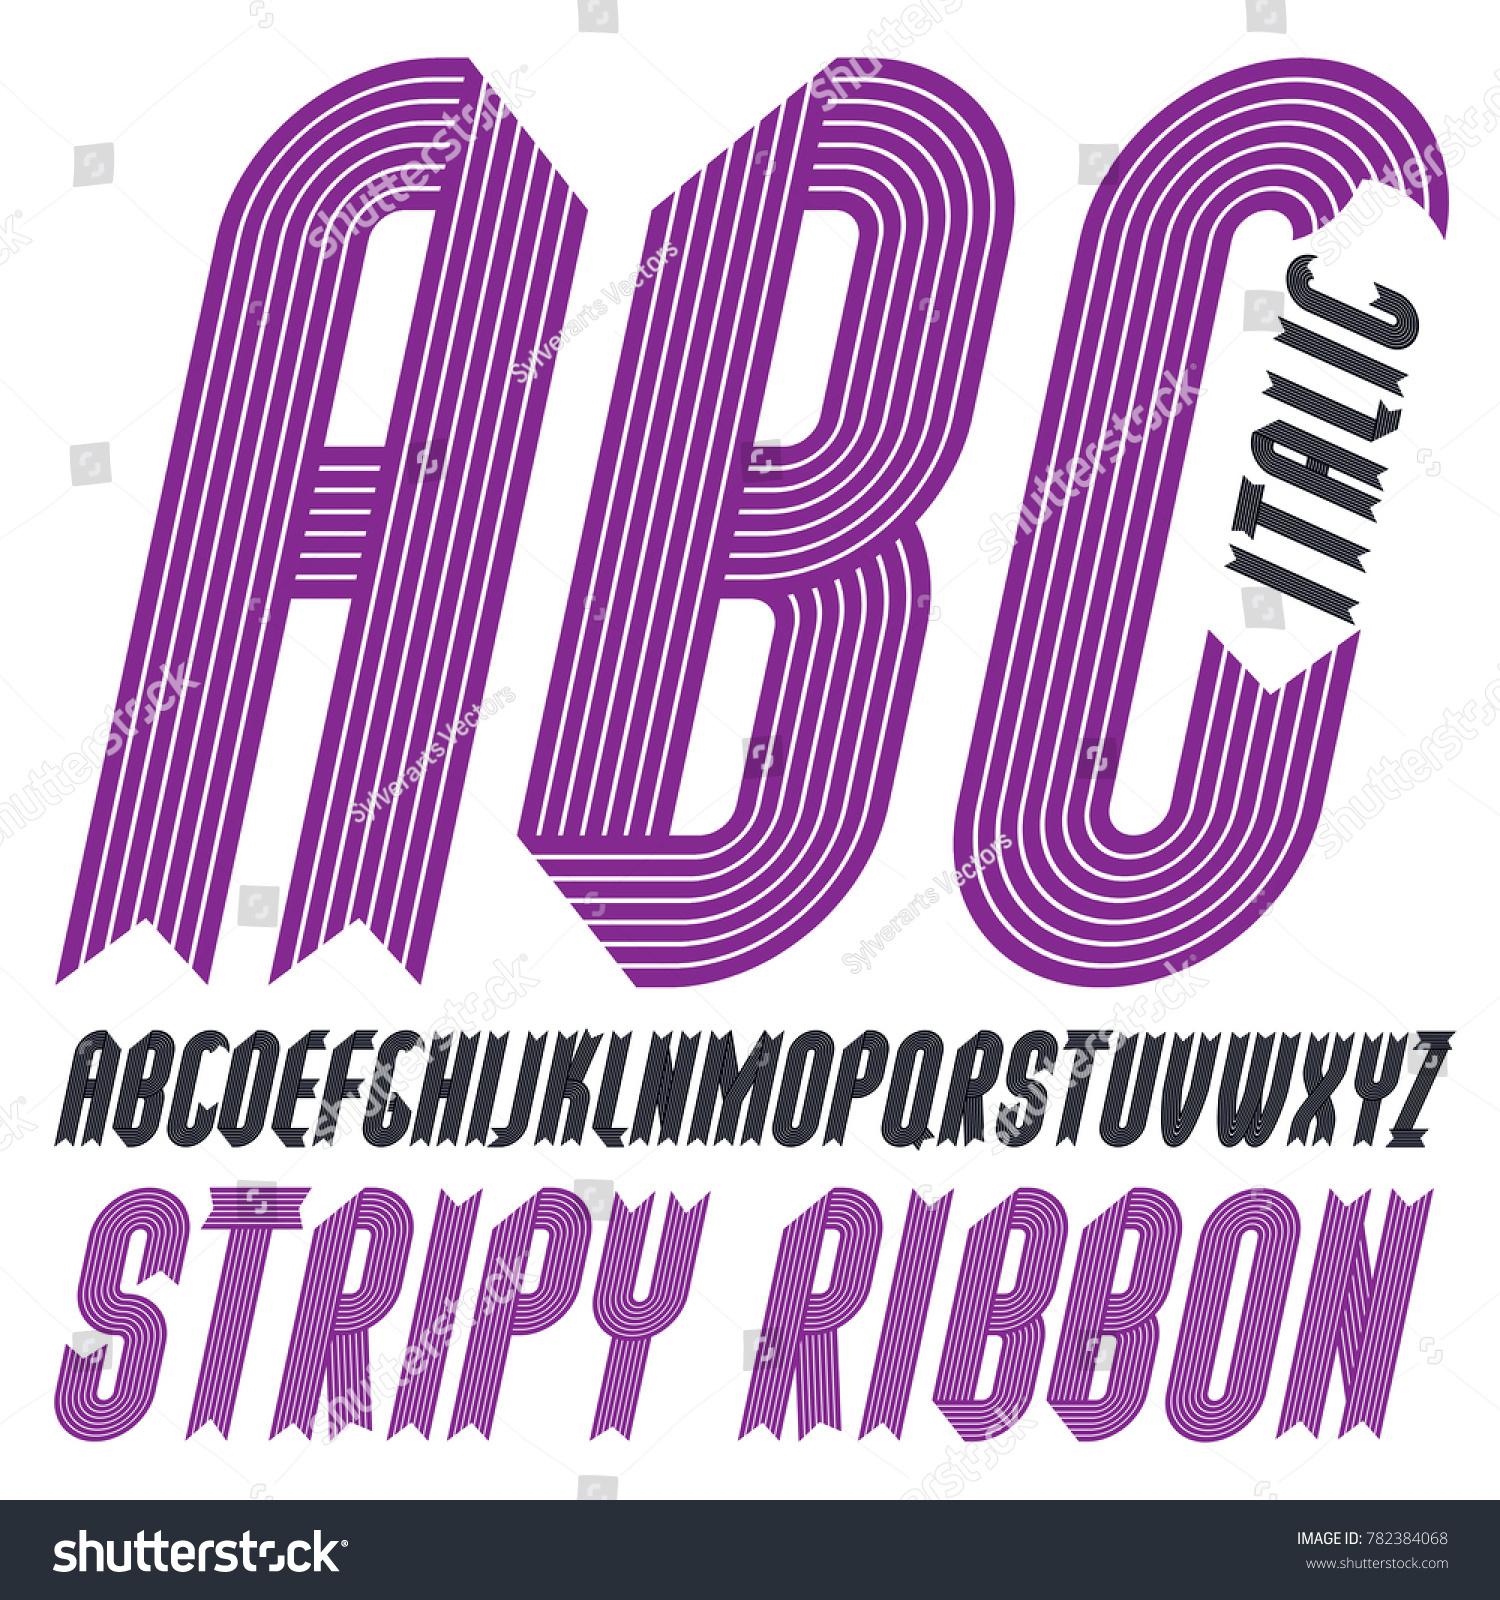 Abc Creation en ce qui concerne trendy modern uppercase alphabet letters abc stock illustration